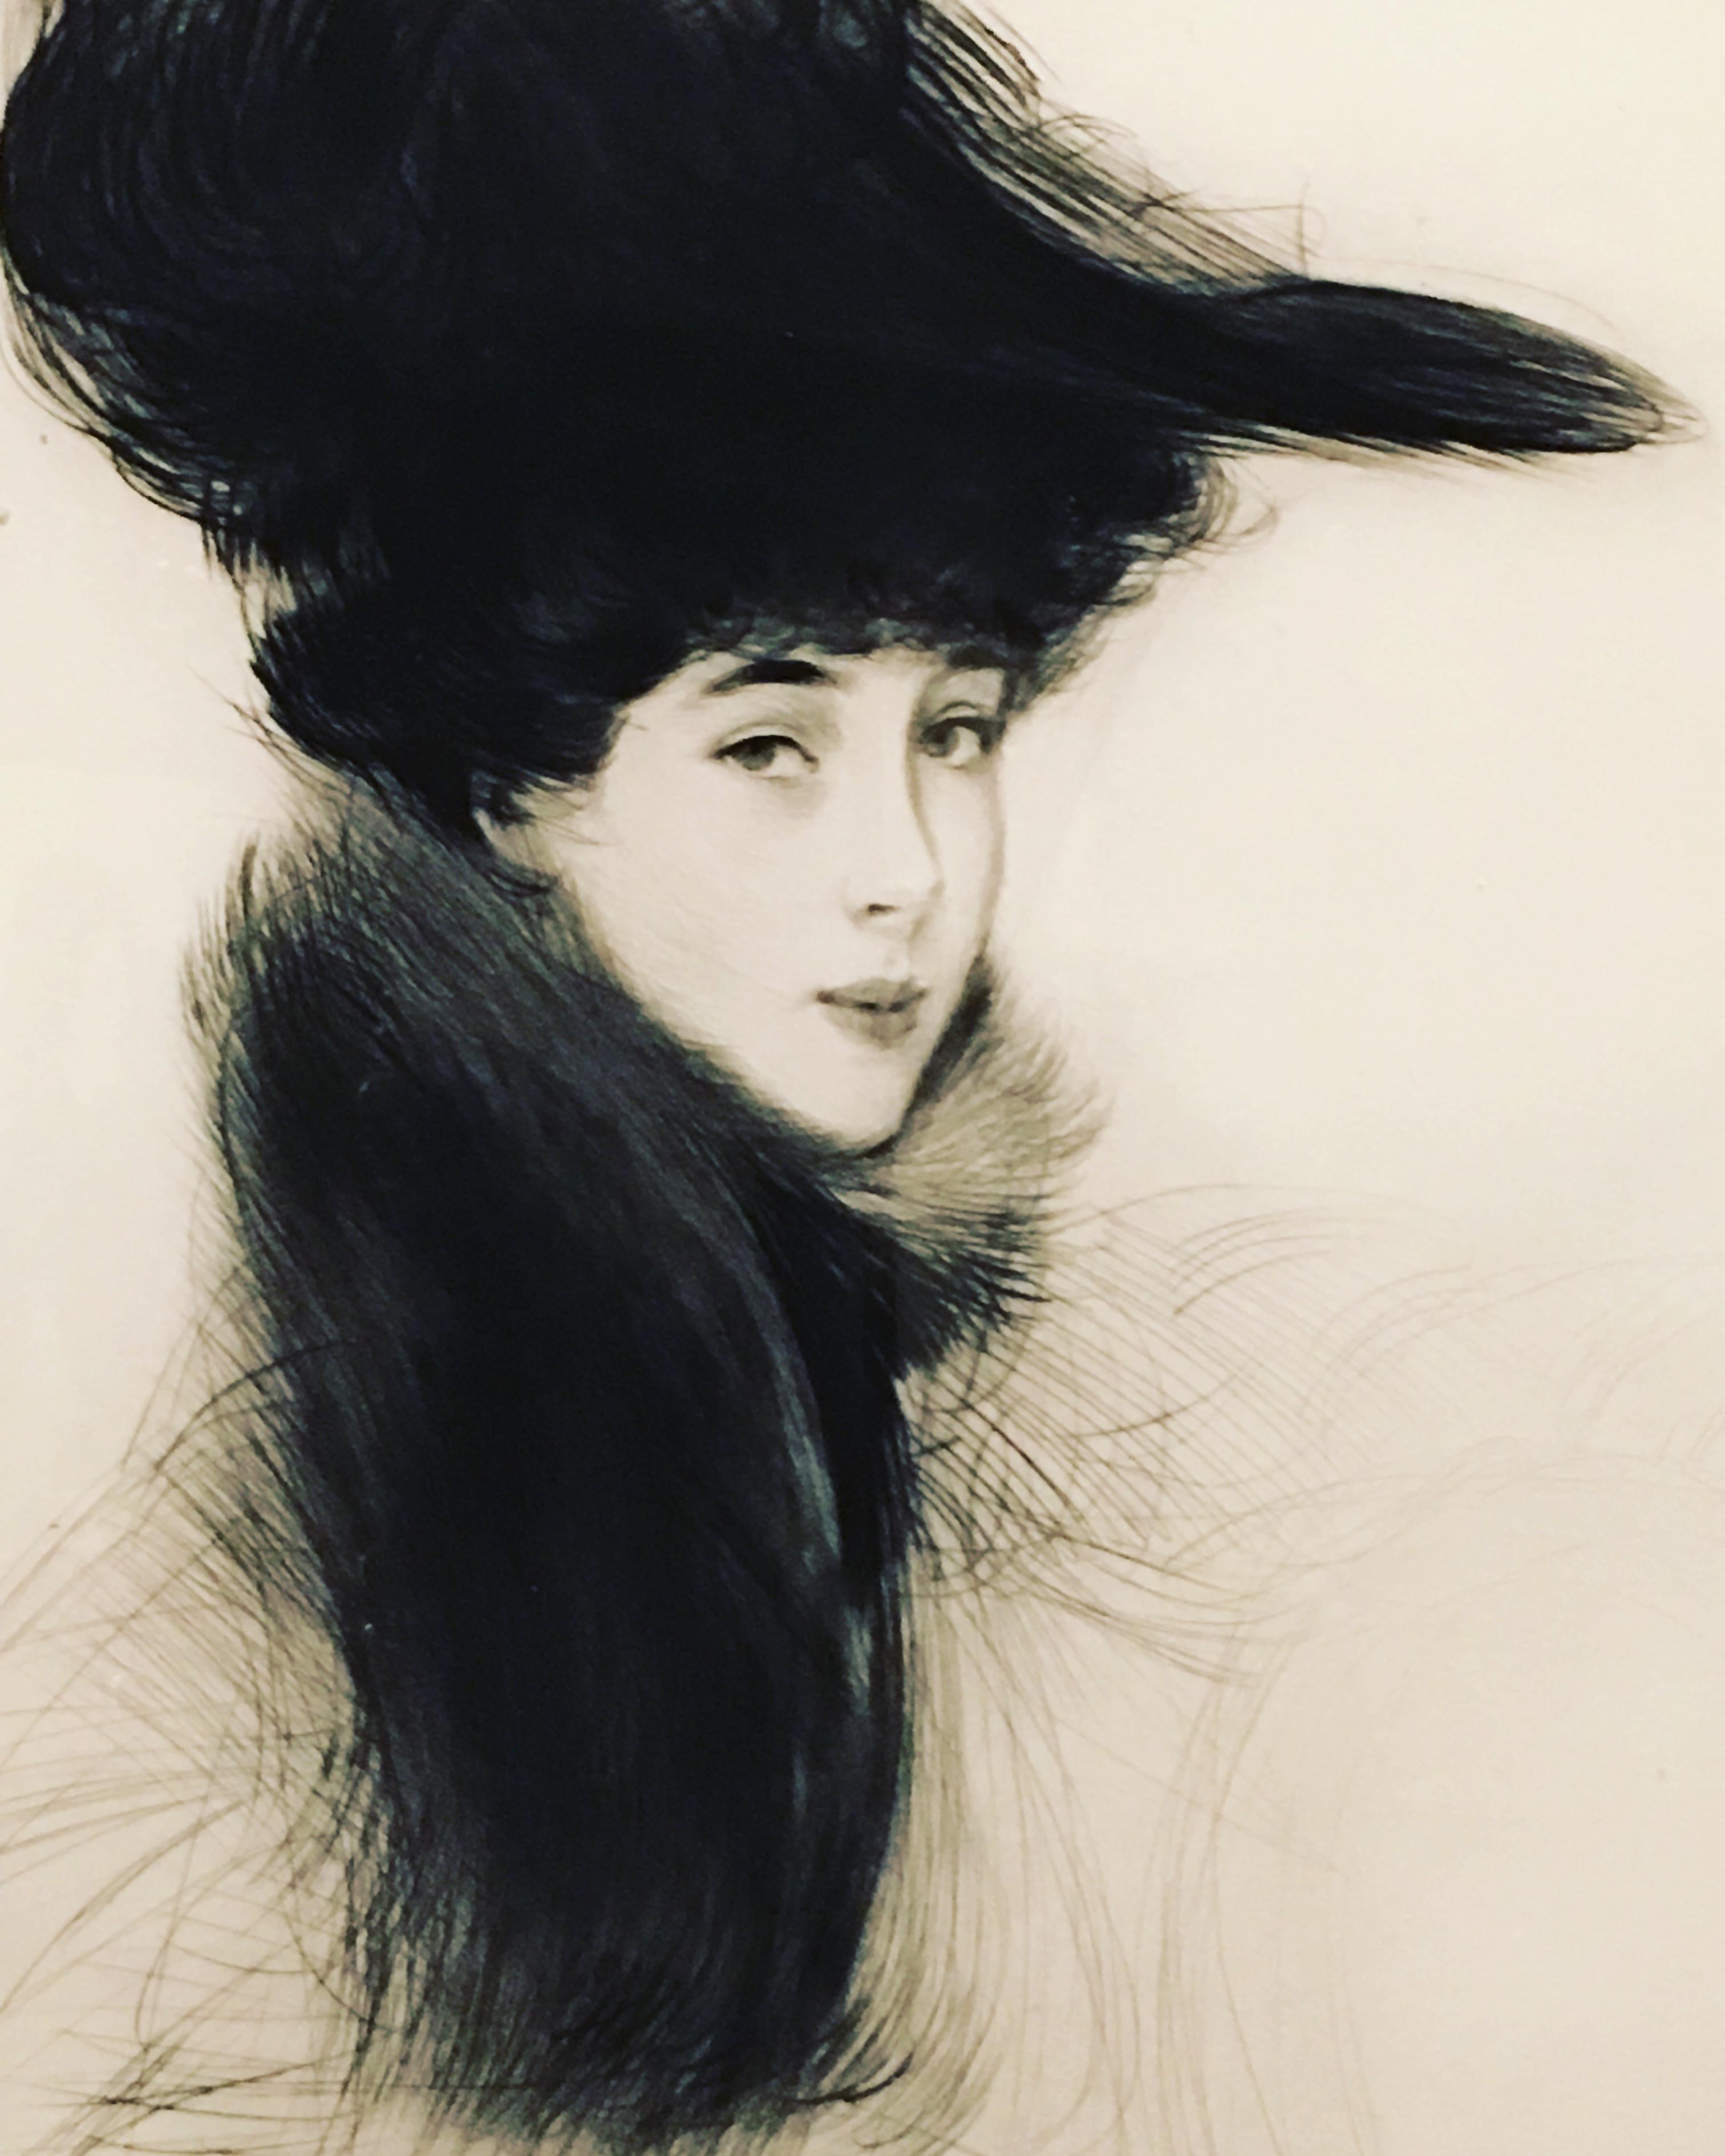 Giovanni Boldini, Consuelo Vanderbilt, 1900